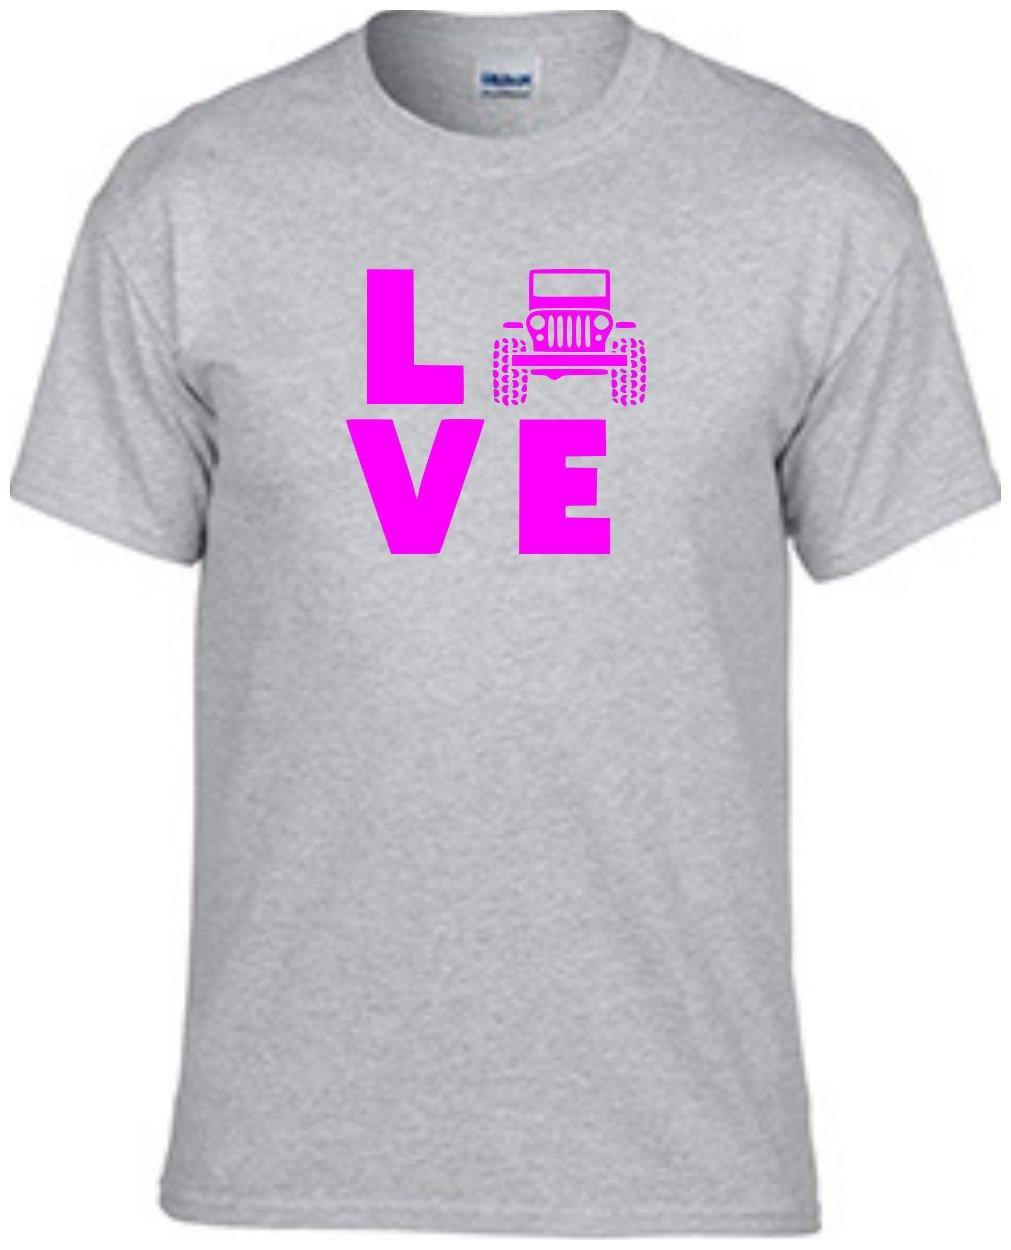 Jeep Love |Jeep | Pink Design | Mens Grey T-Shirts